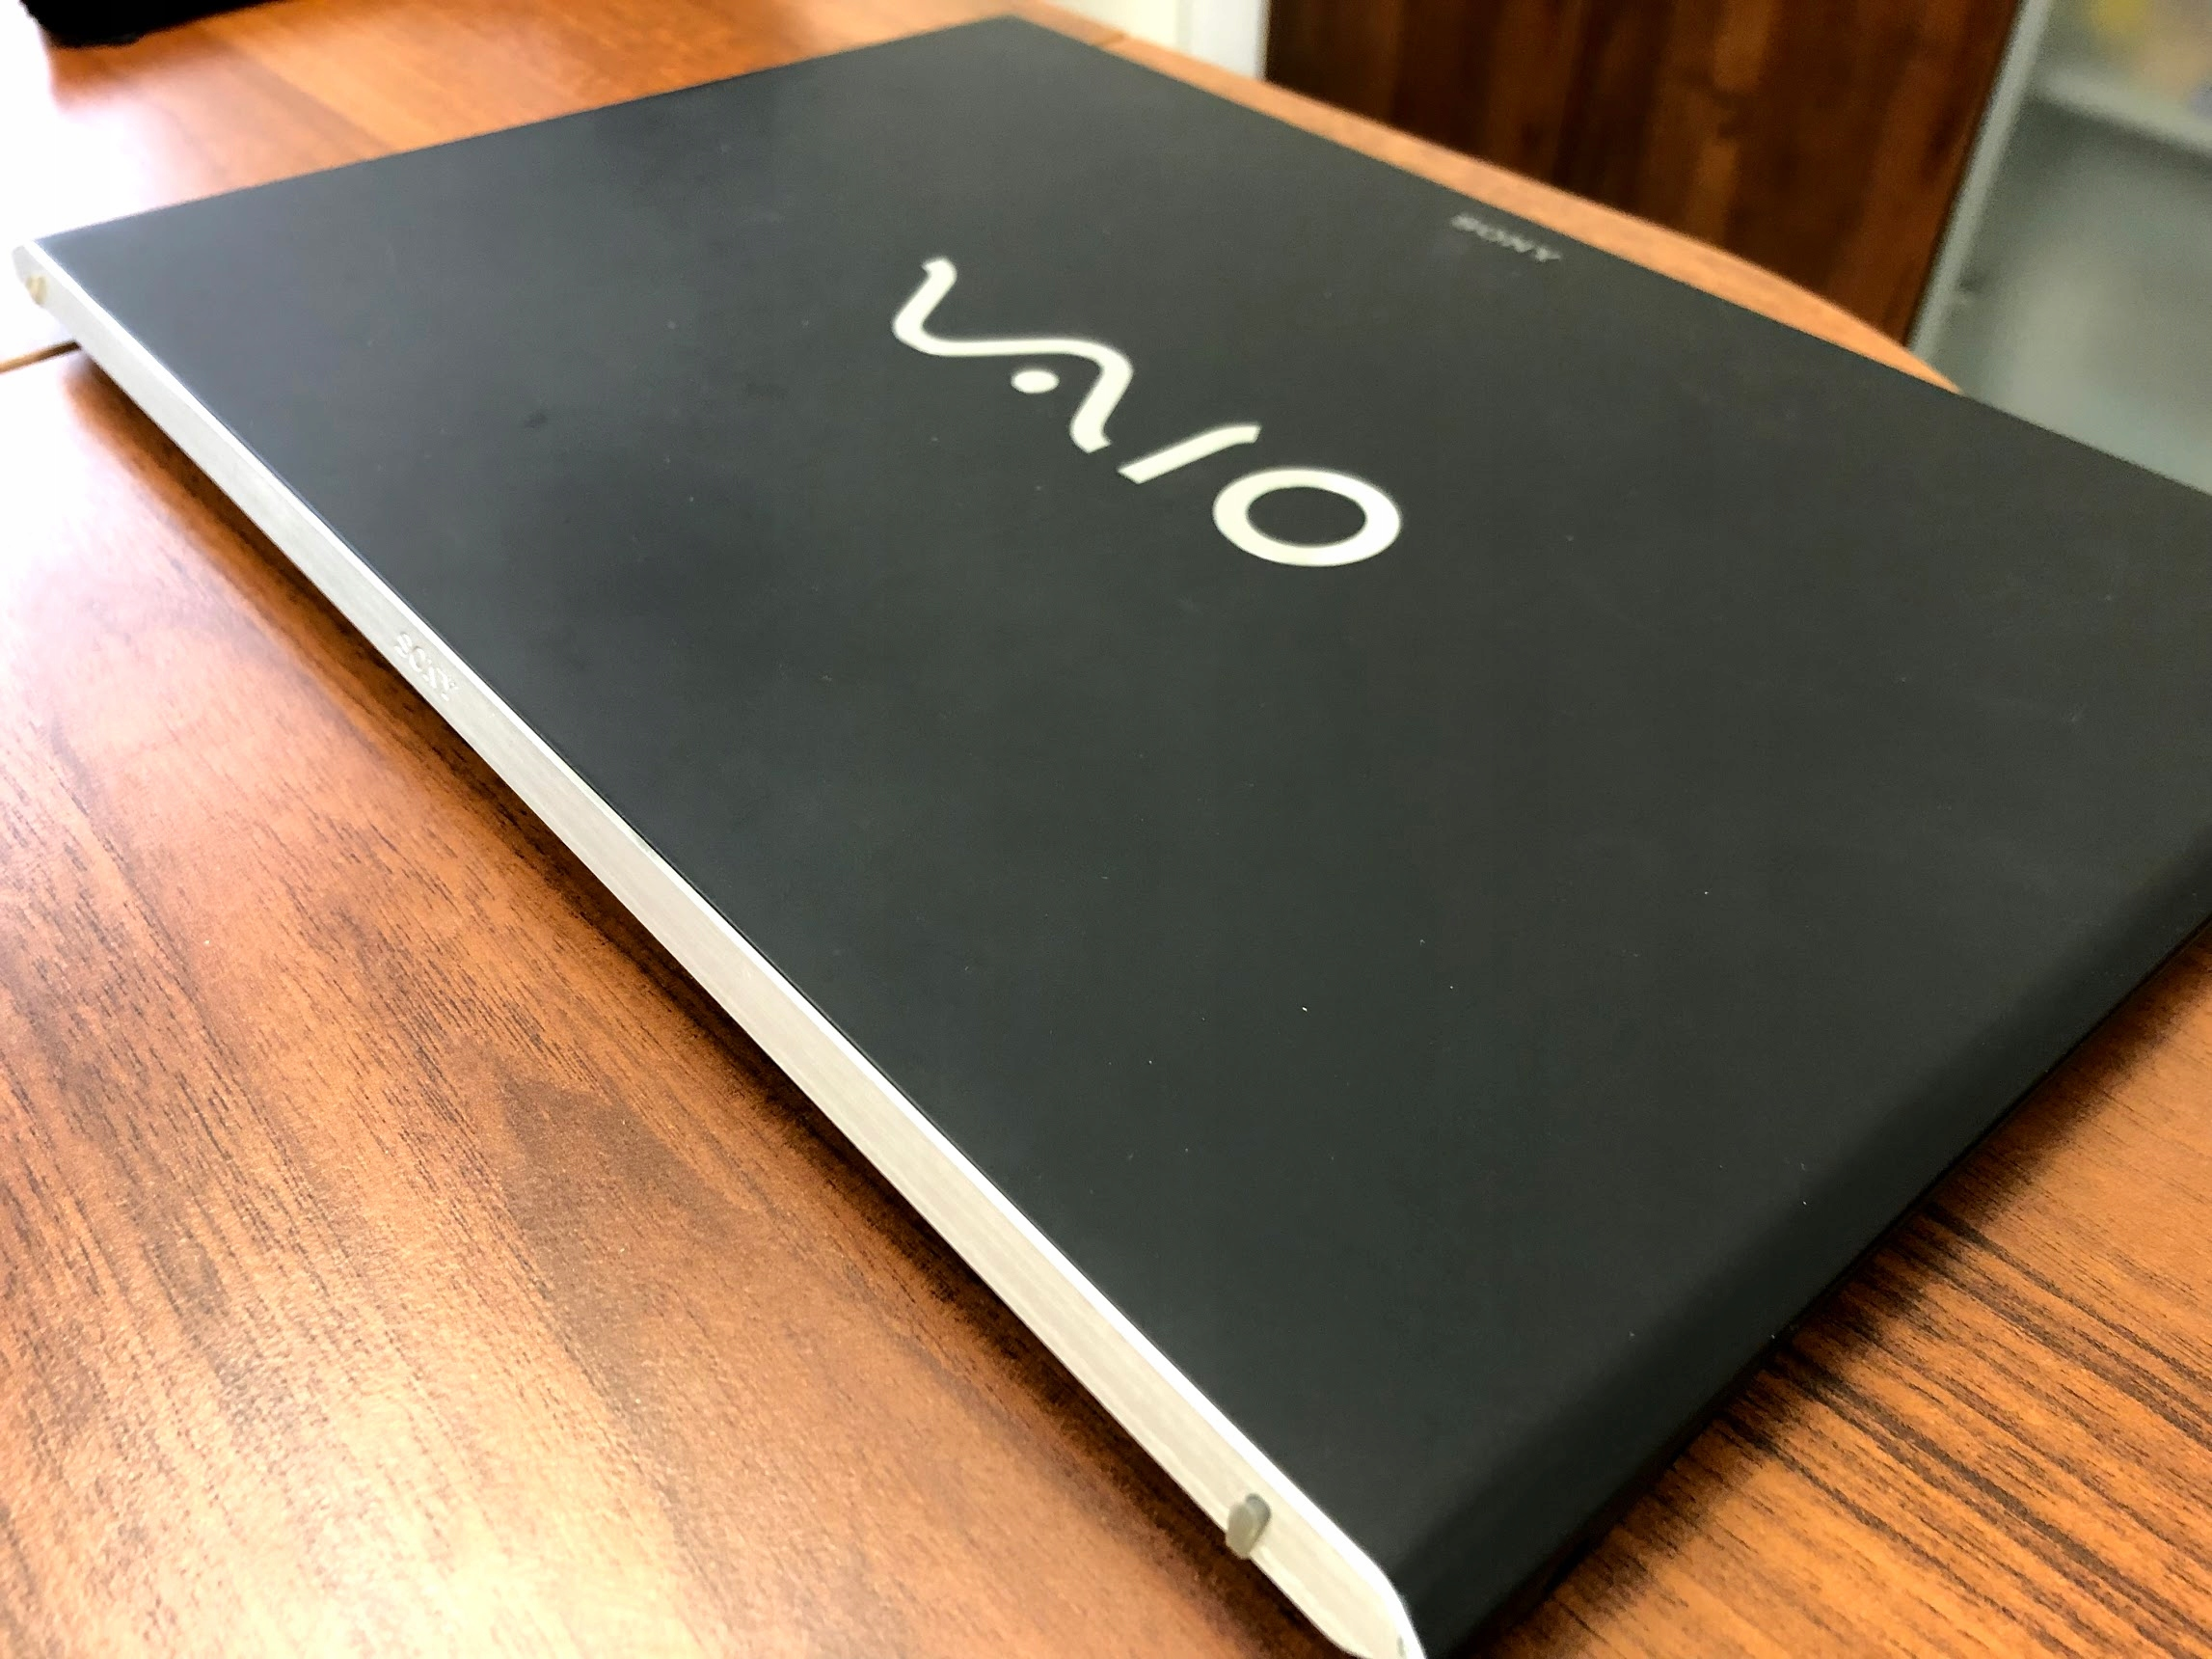 Ultrabook Sony Vaio SVP13, Sony Vaio Pro 13